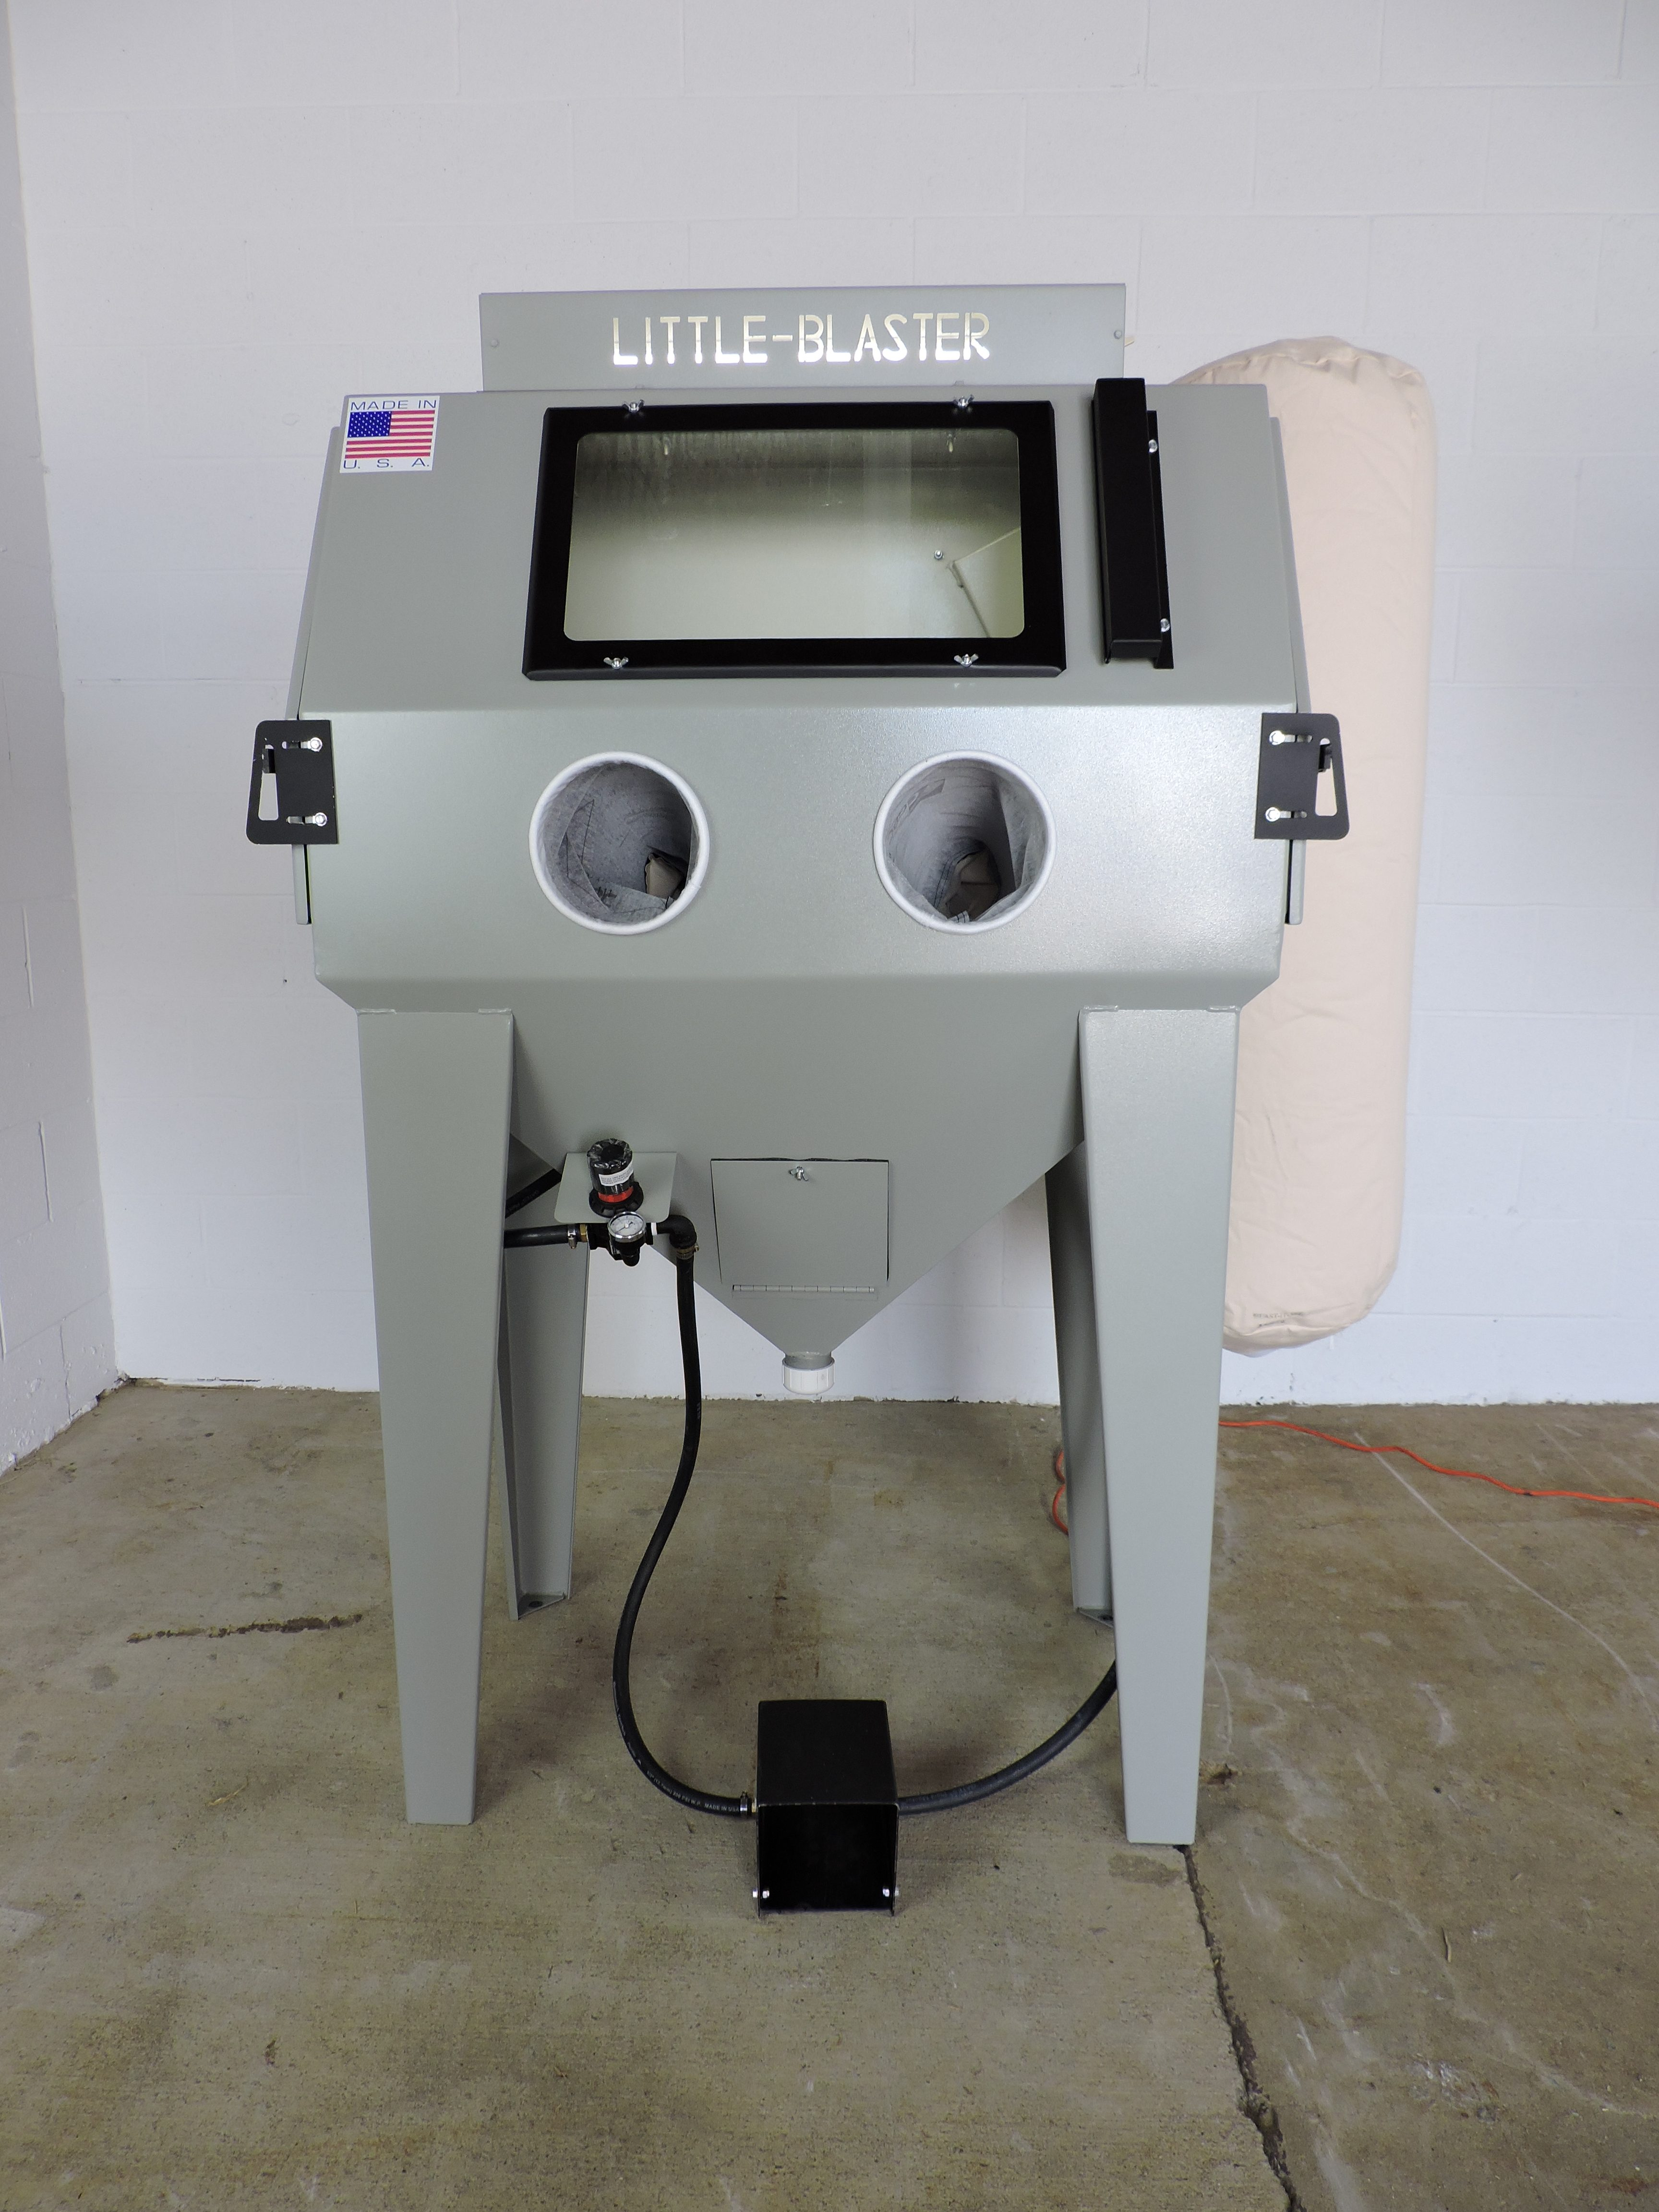 Little Blaster – Blast It All